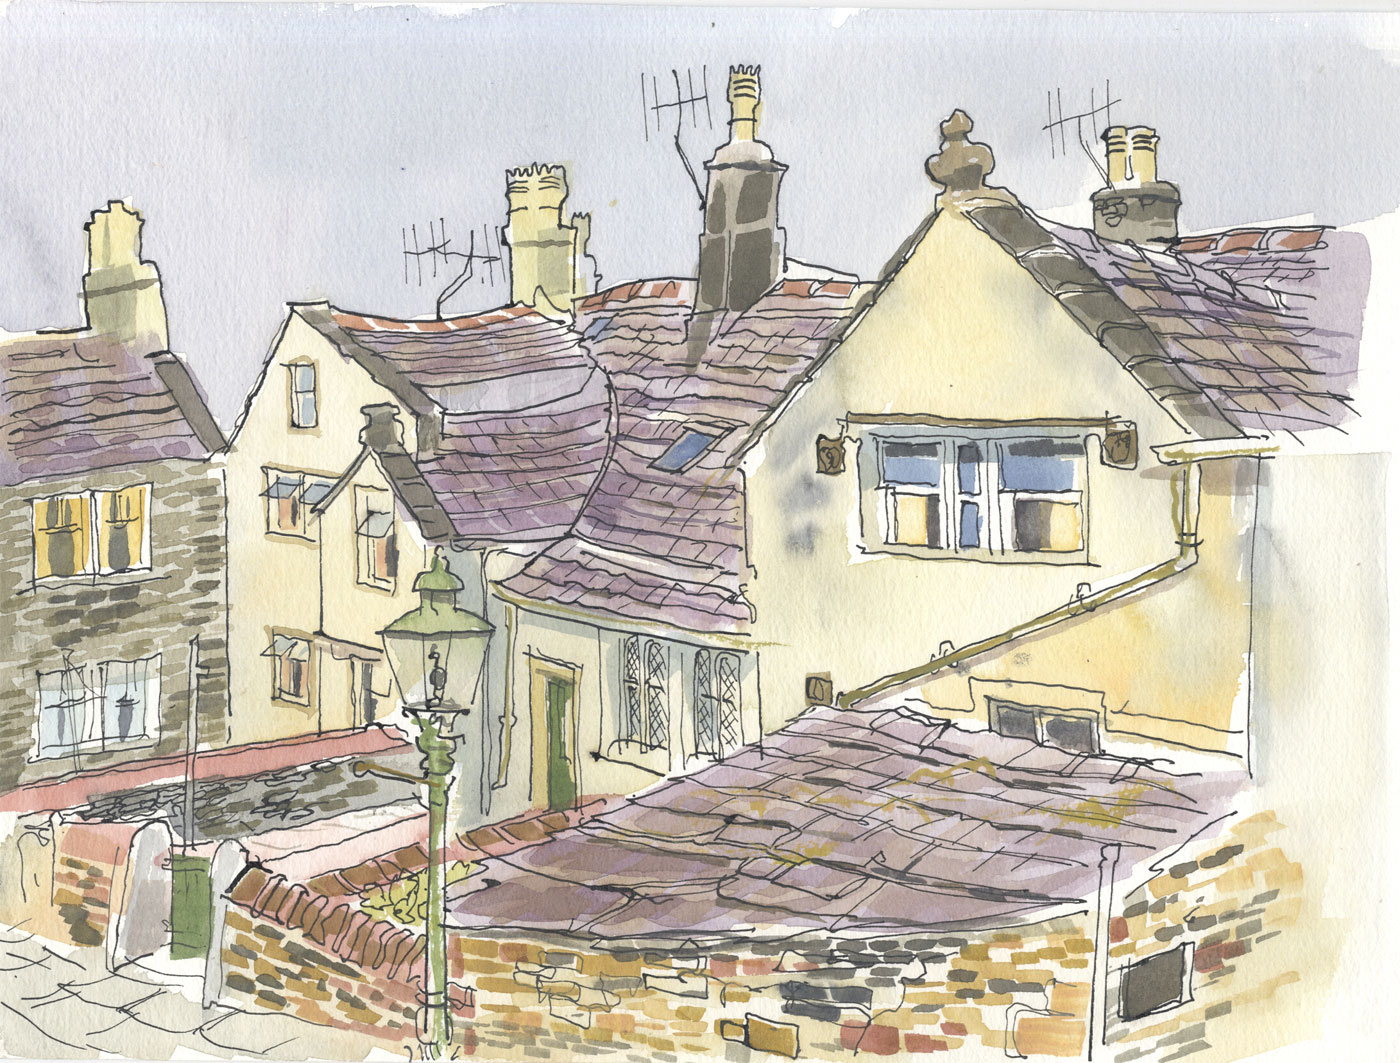 Robert T. Blayney (1929-2016) - Mid 20th Century Watercolour, House View